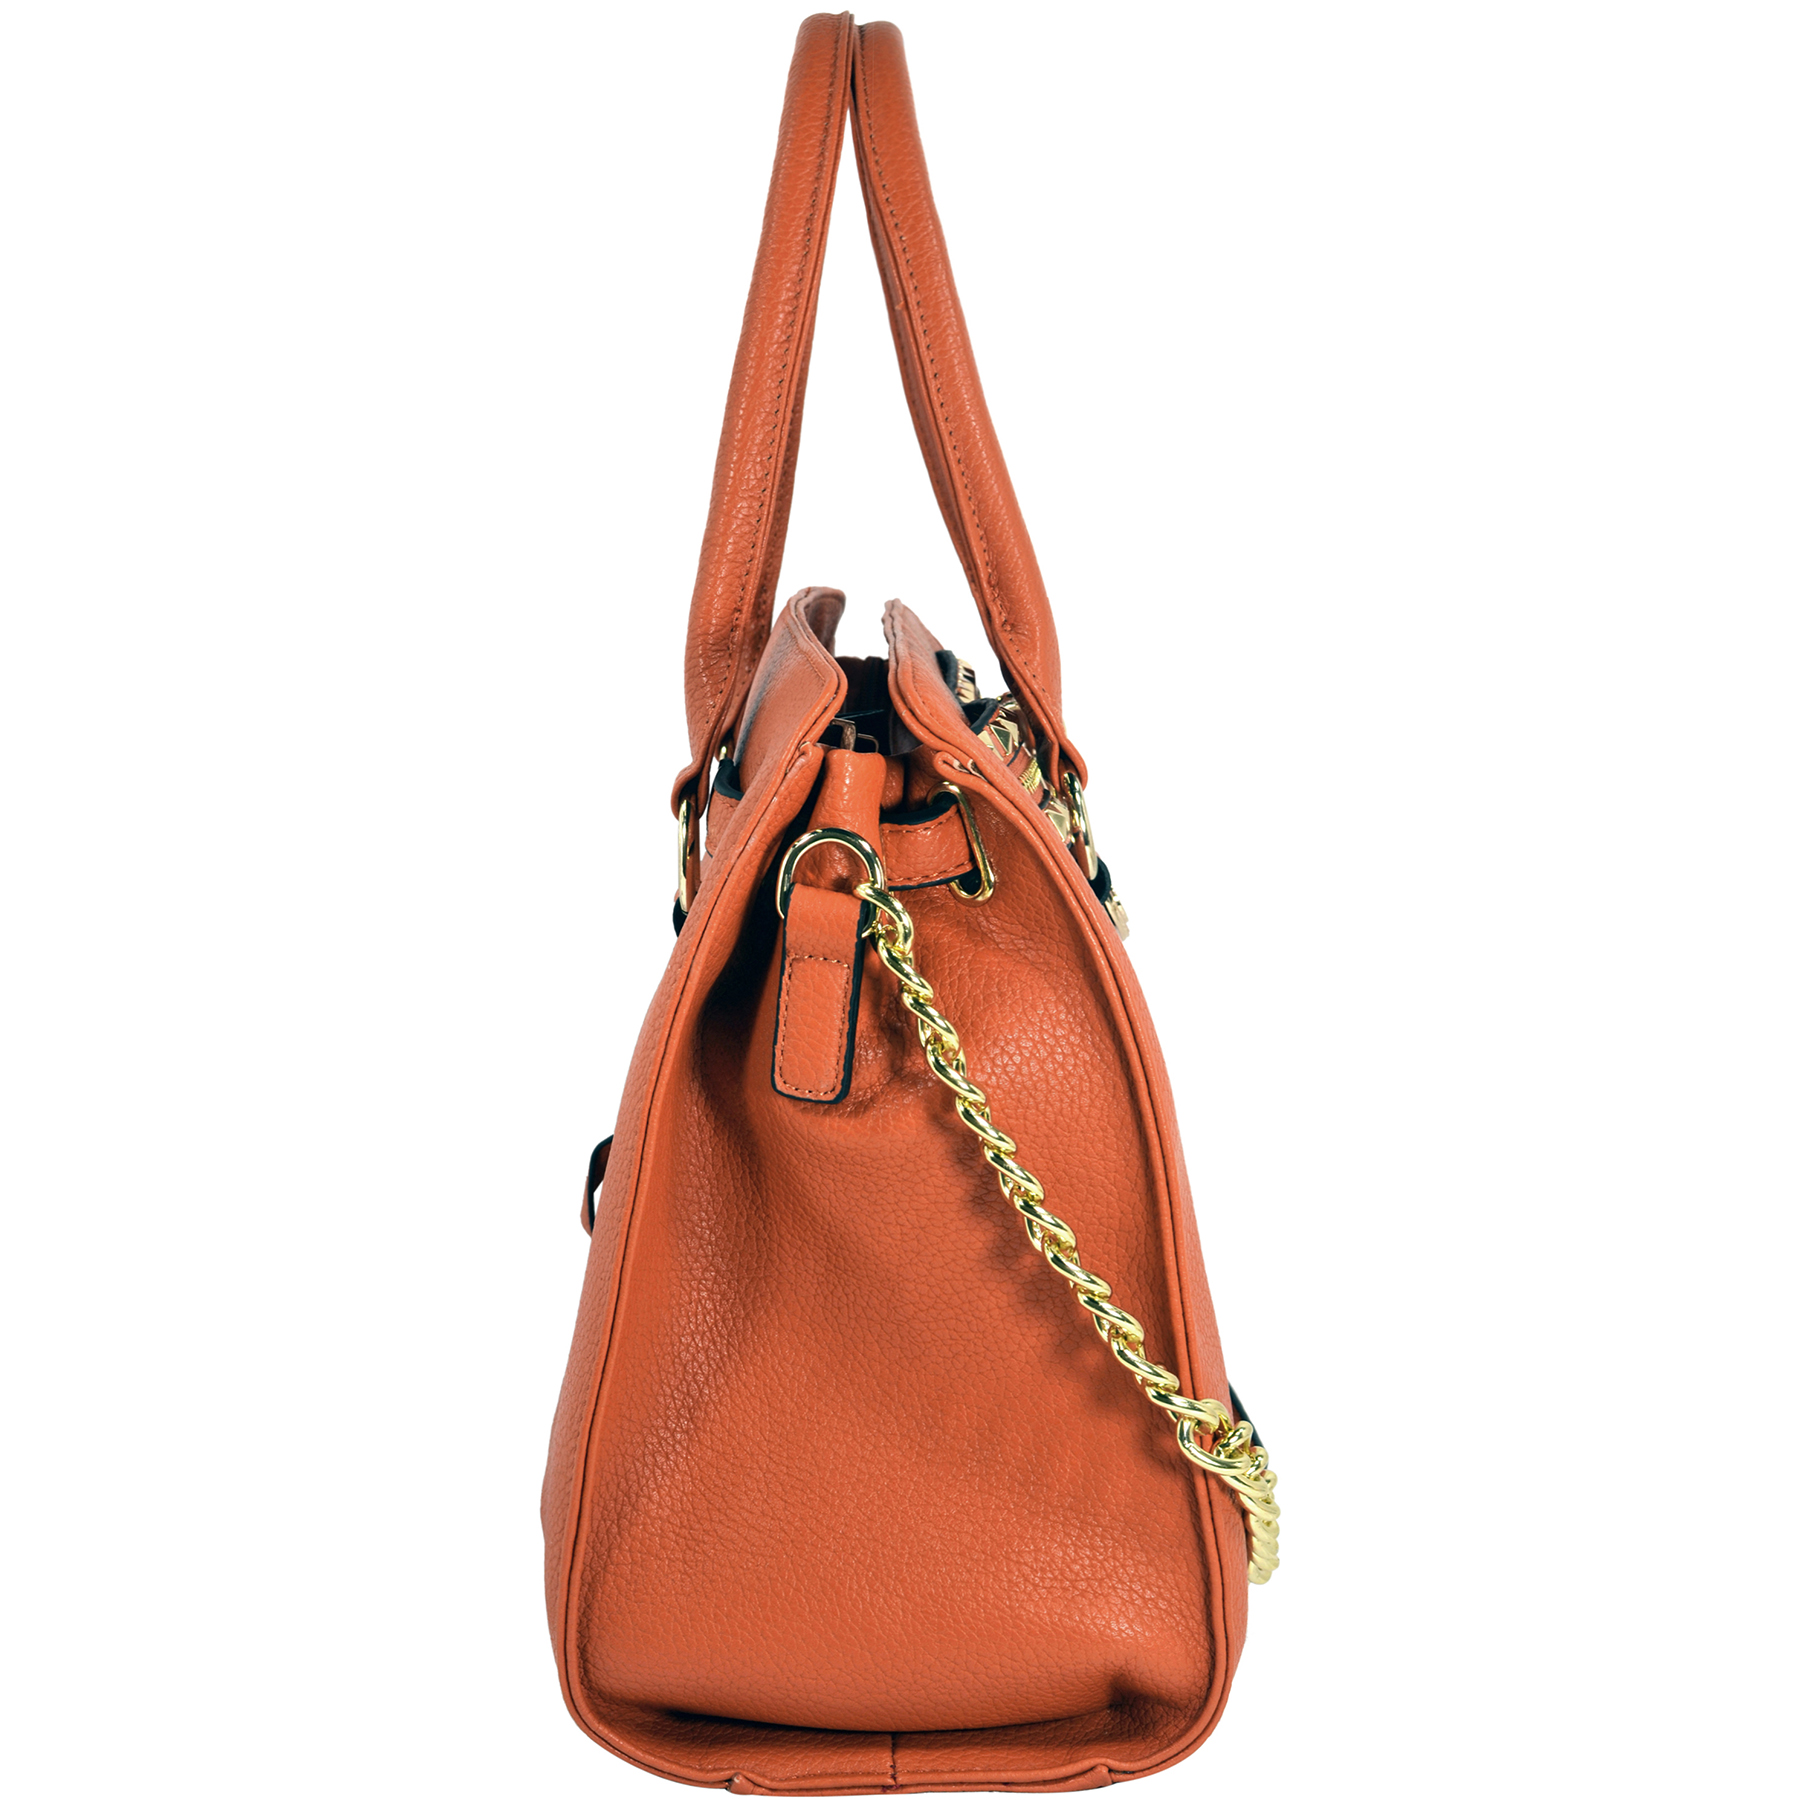 HALEY Orange Bowler Style Handbag Side